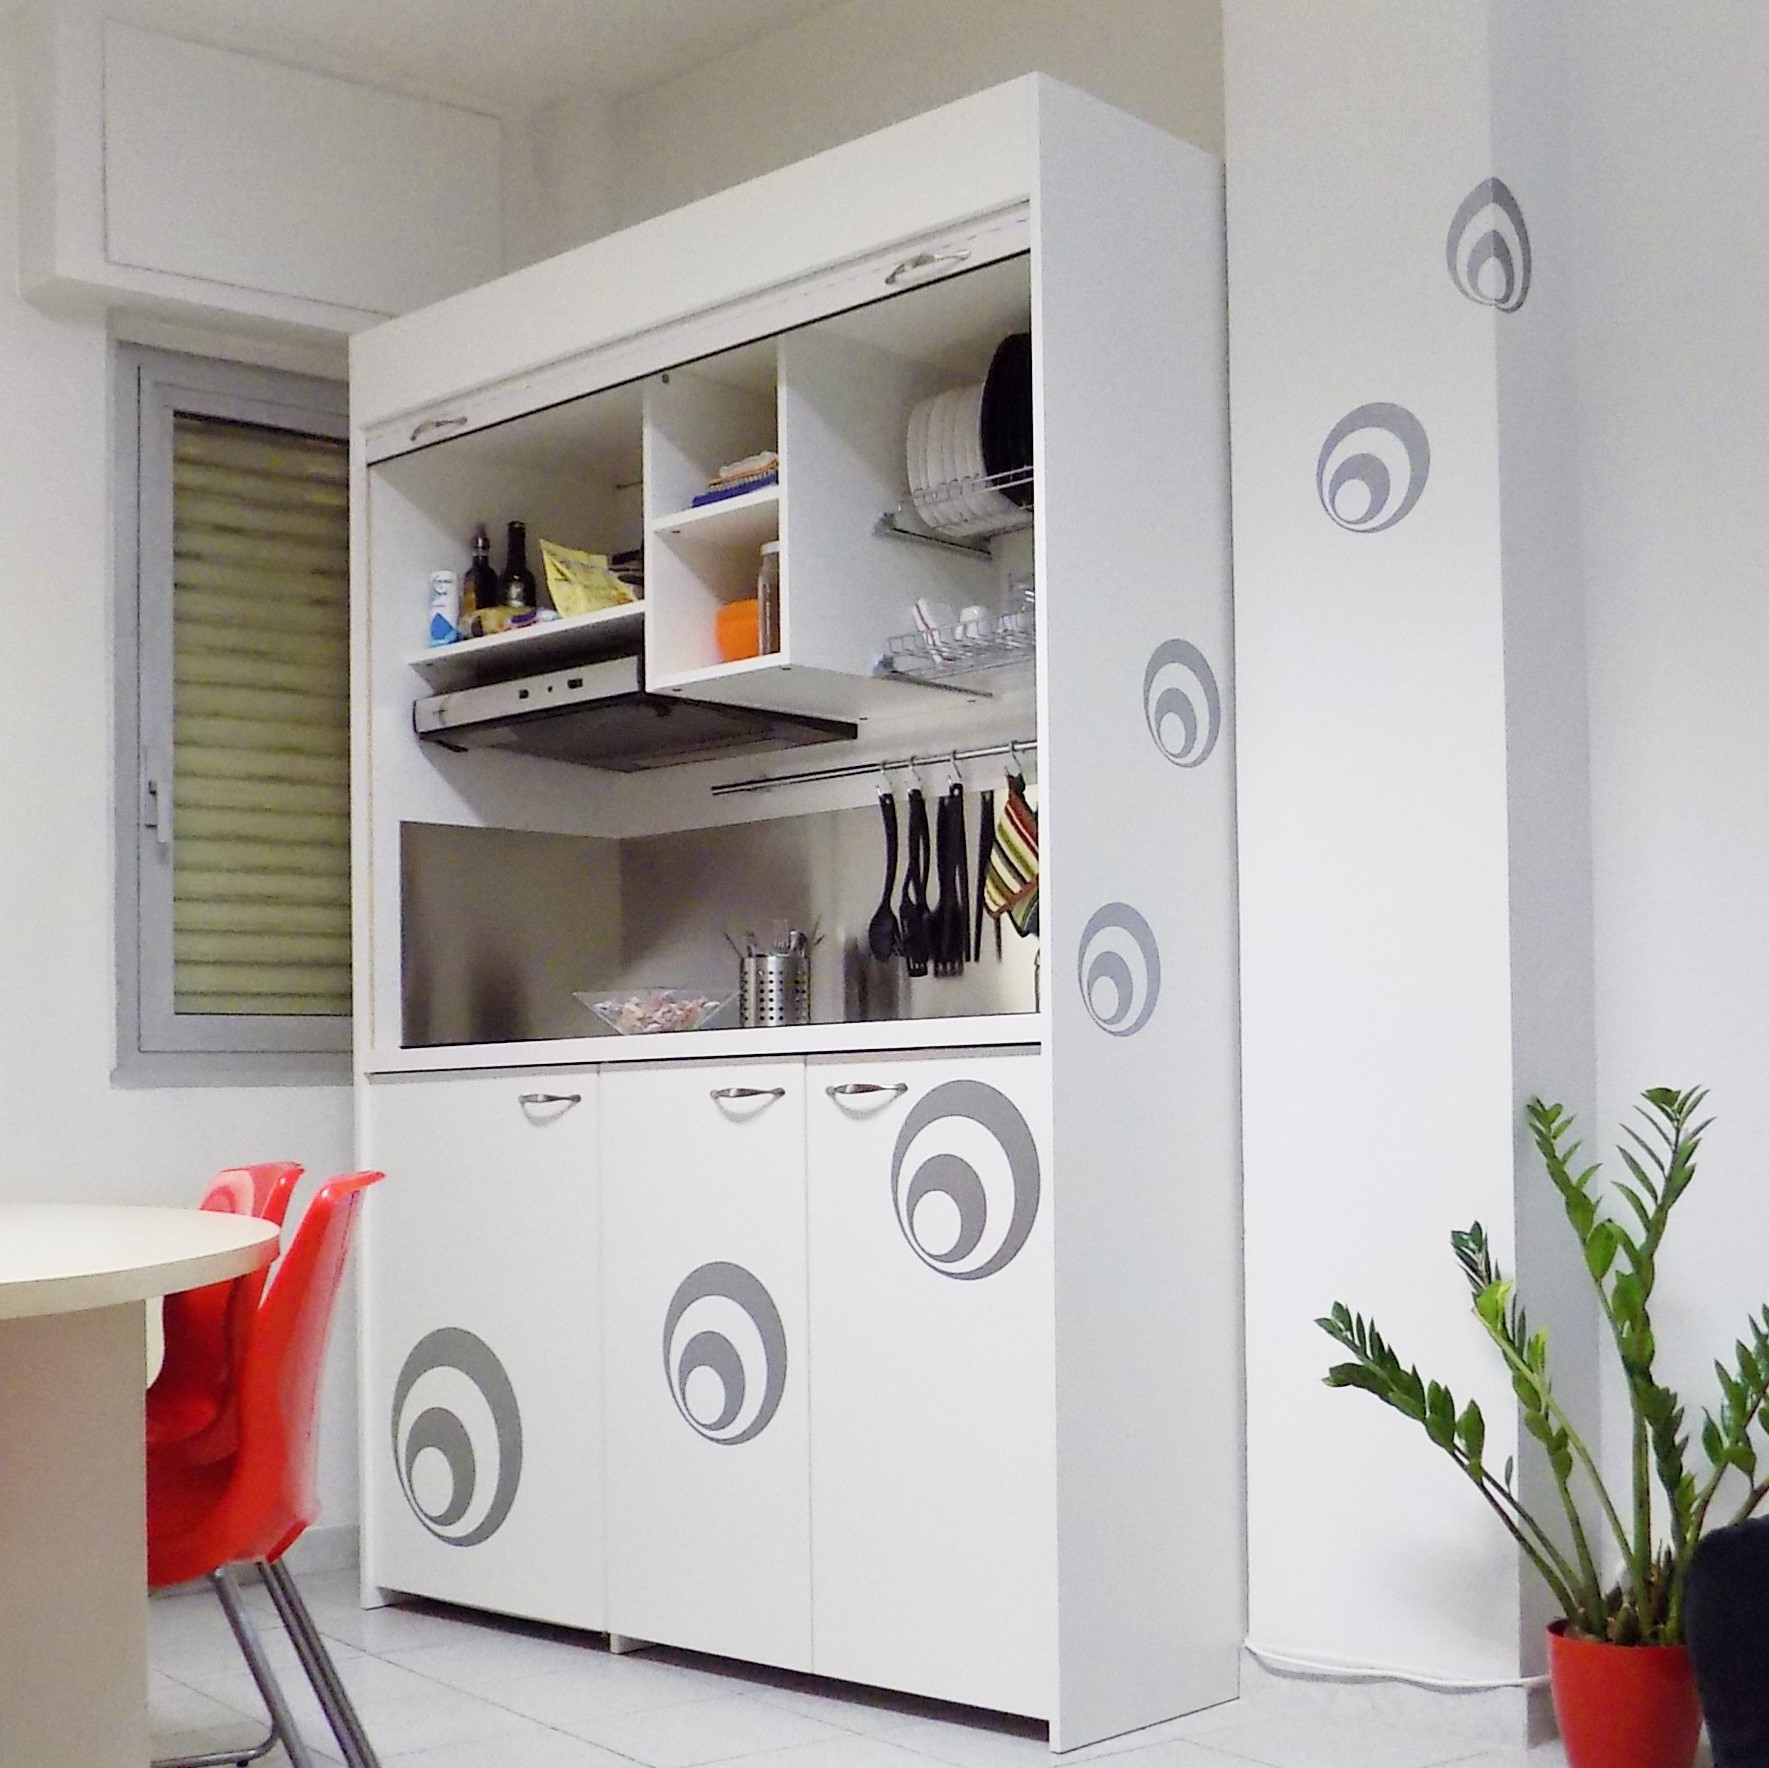 Angolo Cottura A Scomparsa S5d8 Cucine A S Parsa Foto Design ...